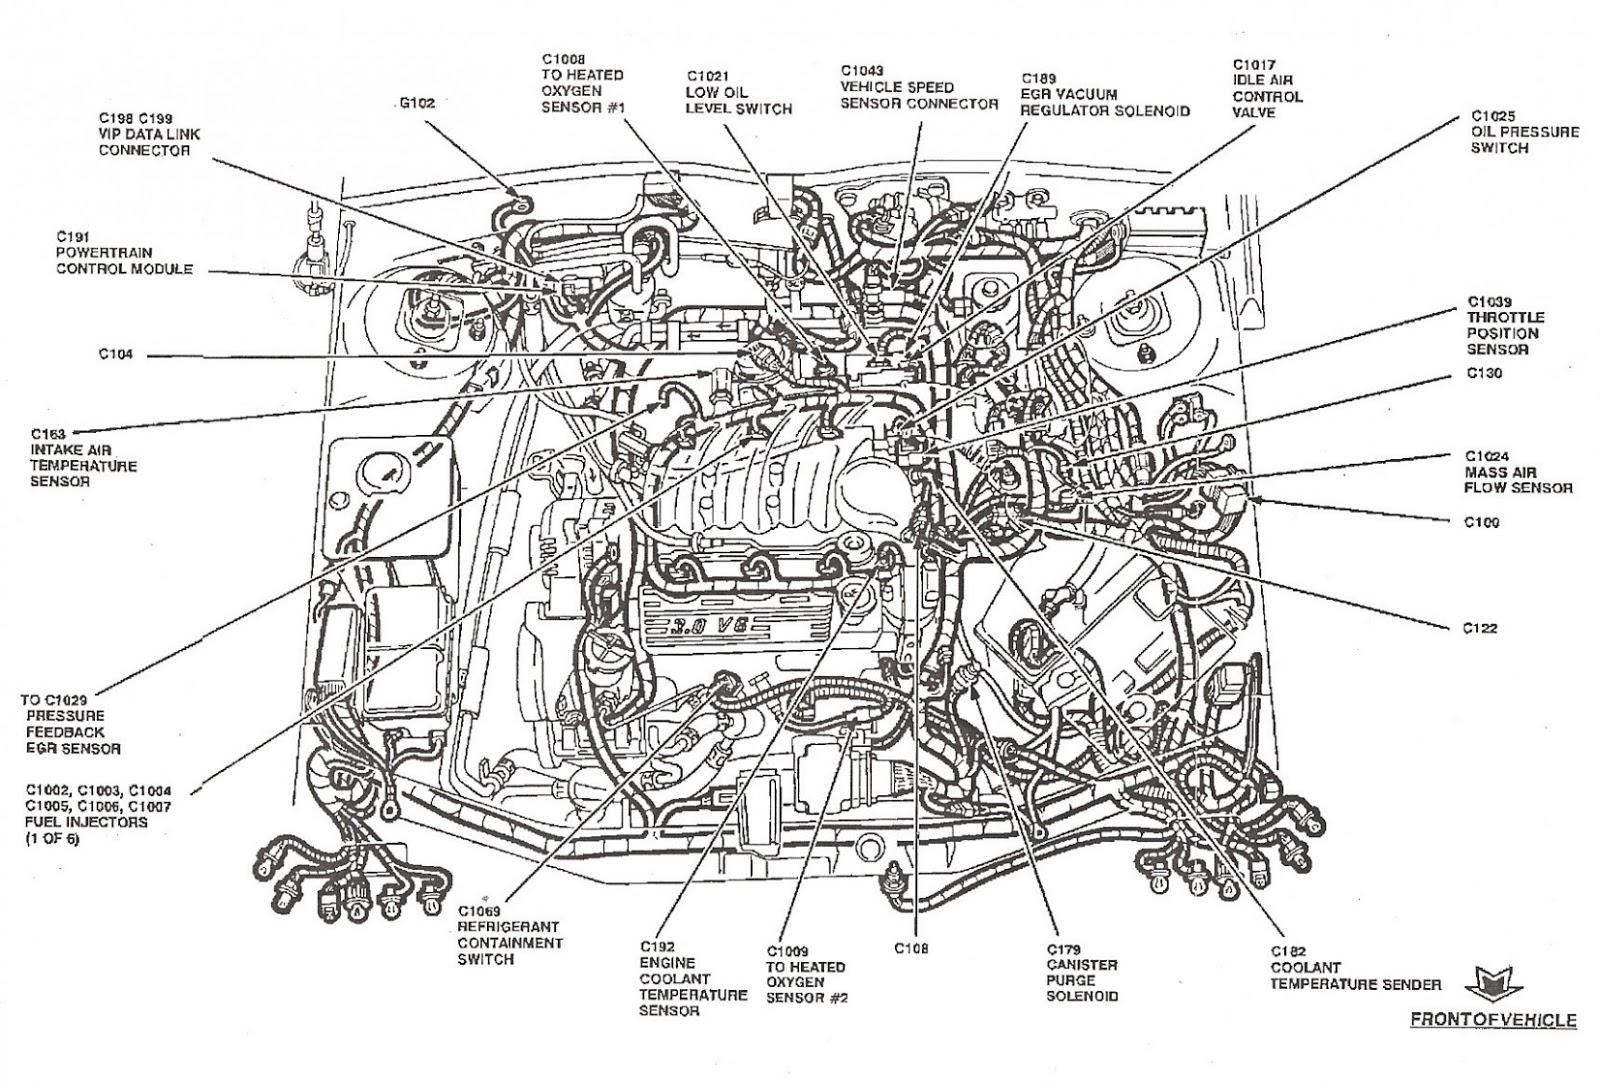 ford escape 3 0 engine diagram 2001 ford escape engine diagram gain repeat6 klictravel nl  2001 ford escape engine diagram gain